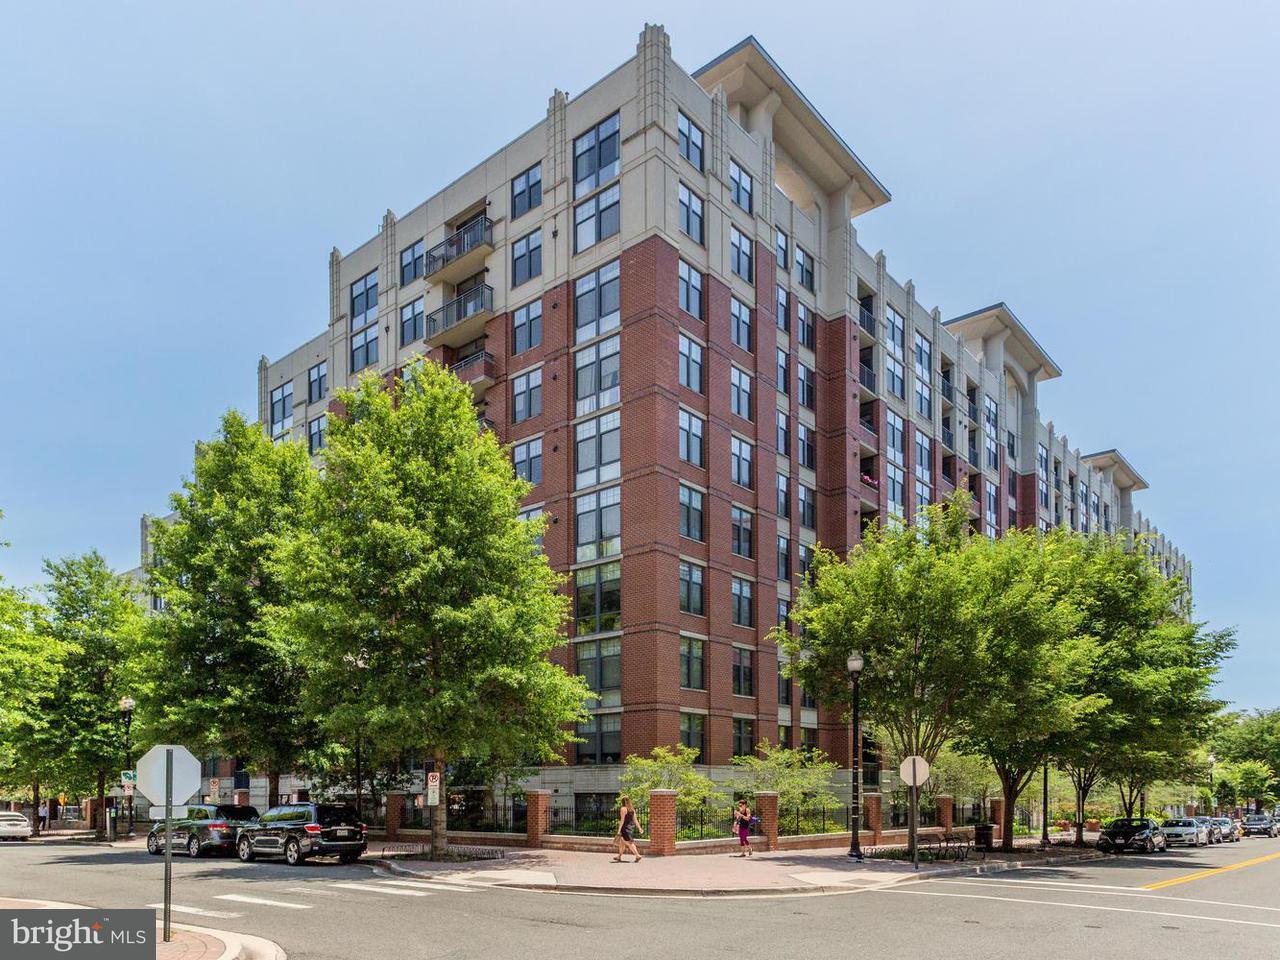 Condominium for Sale at 1021 Garfield St #609 1021 Garfield St #609 Arlington, Virginia 22201 United States